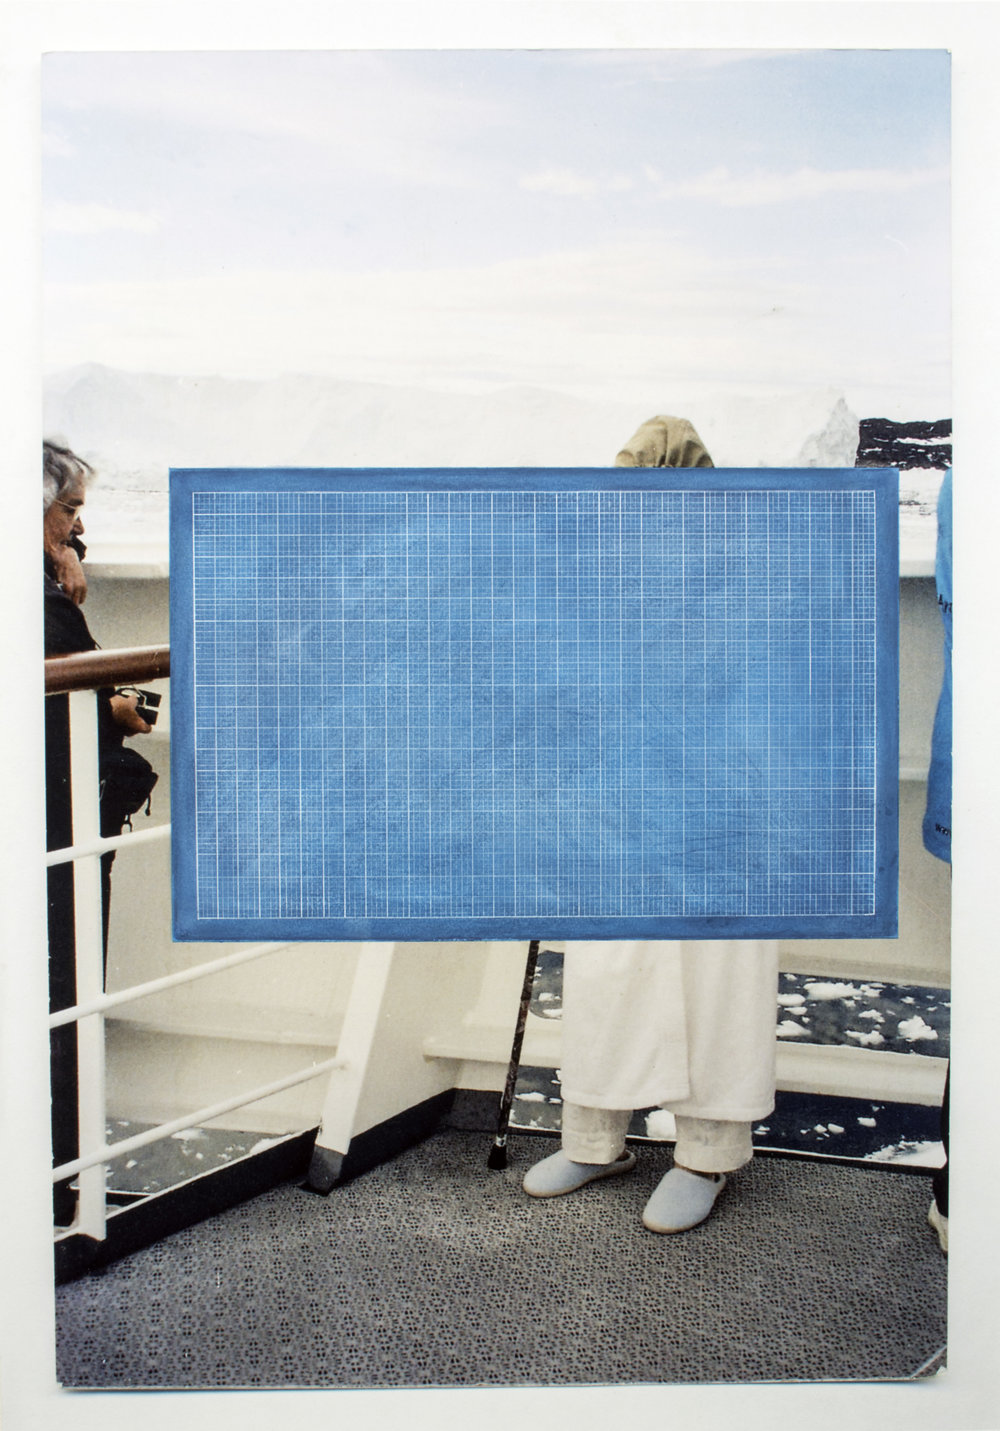 Glaciers  2015  Hahnamuela archival inkjet paper, pastel, pencil  24 X 34 Inches